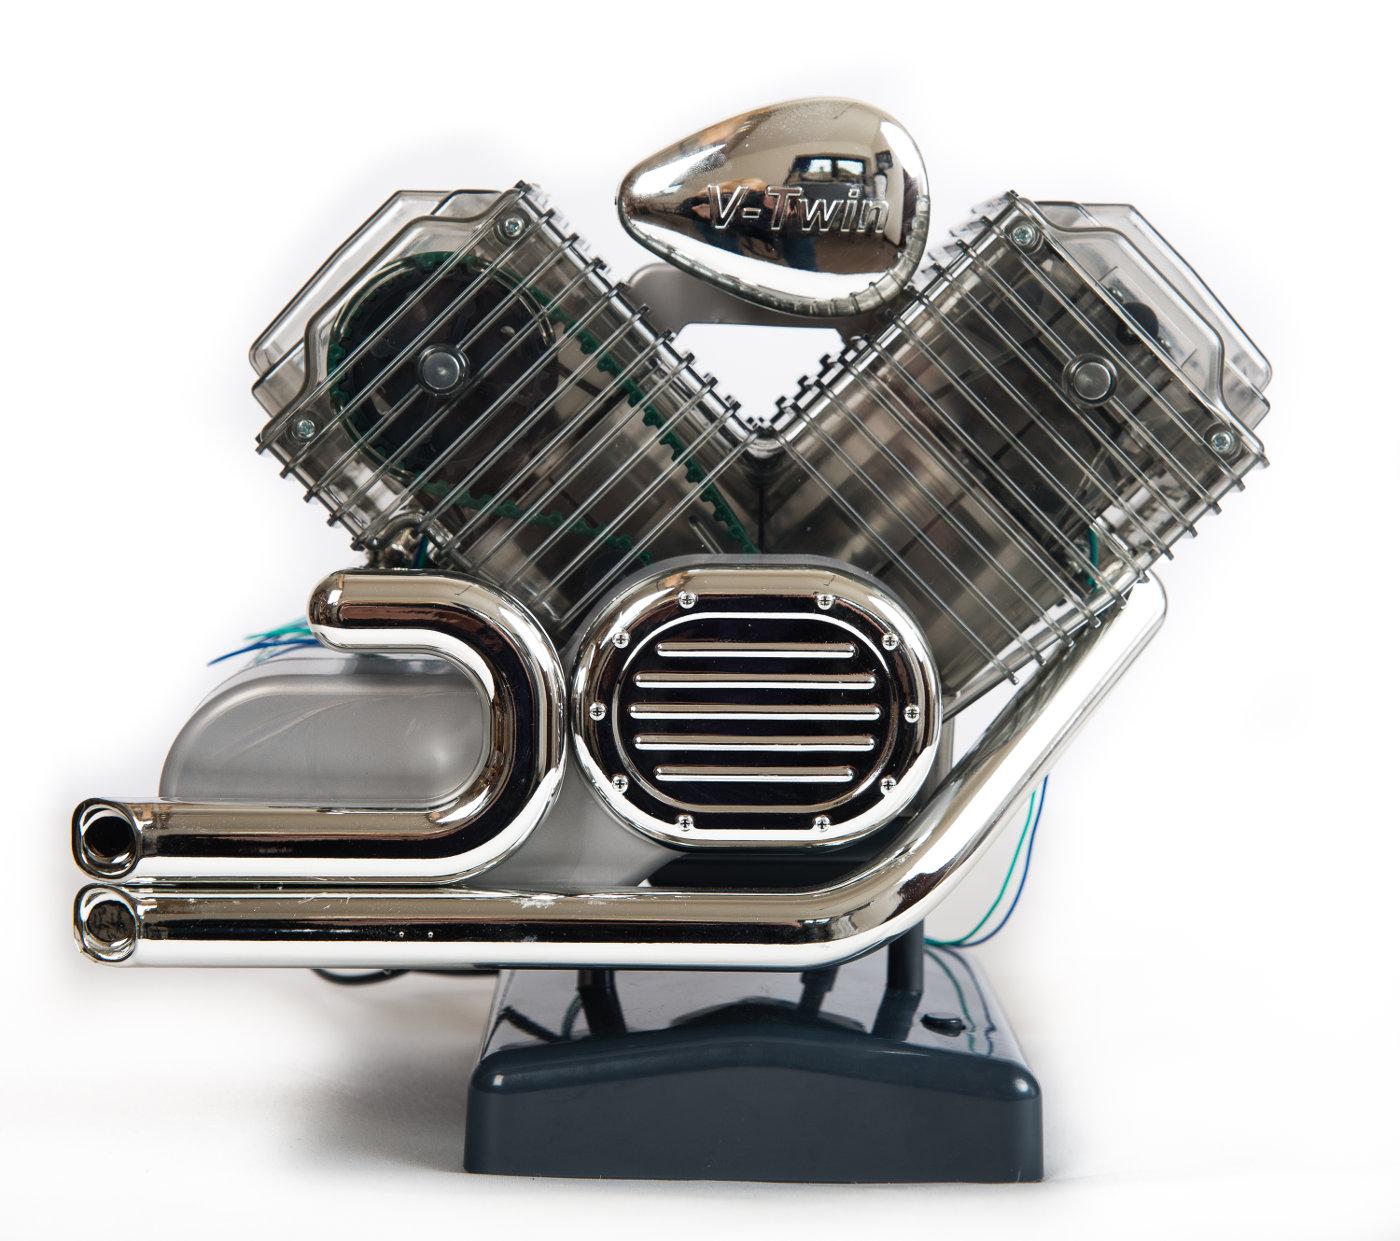 Haynes V Twin Motorcycle Engine Model Kit